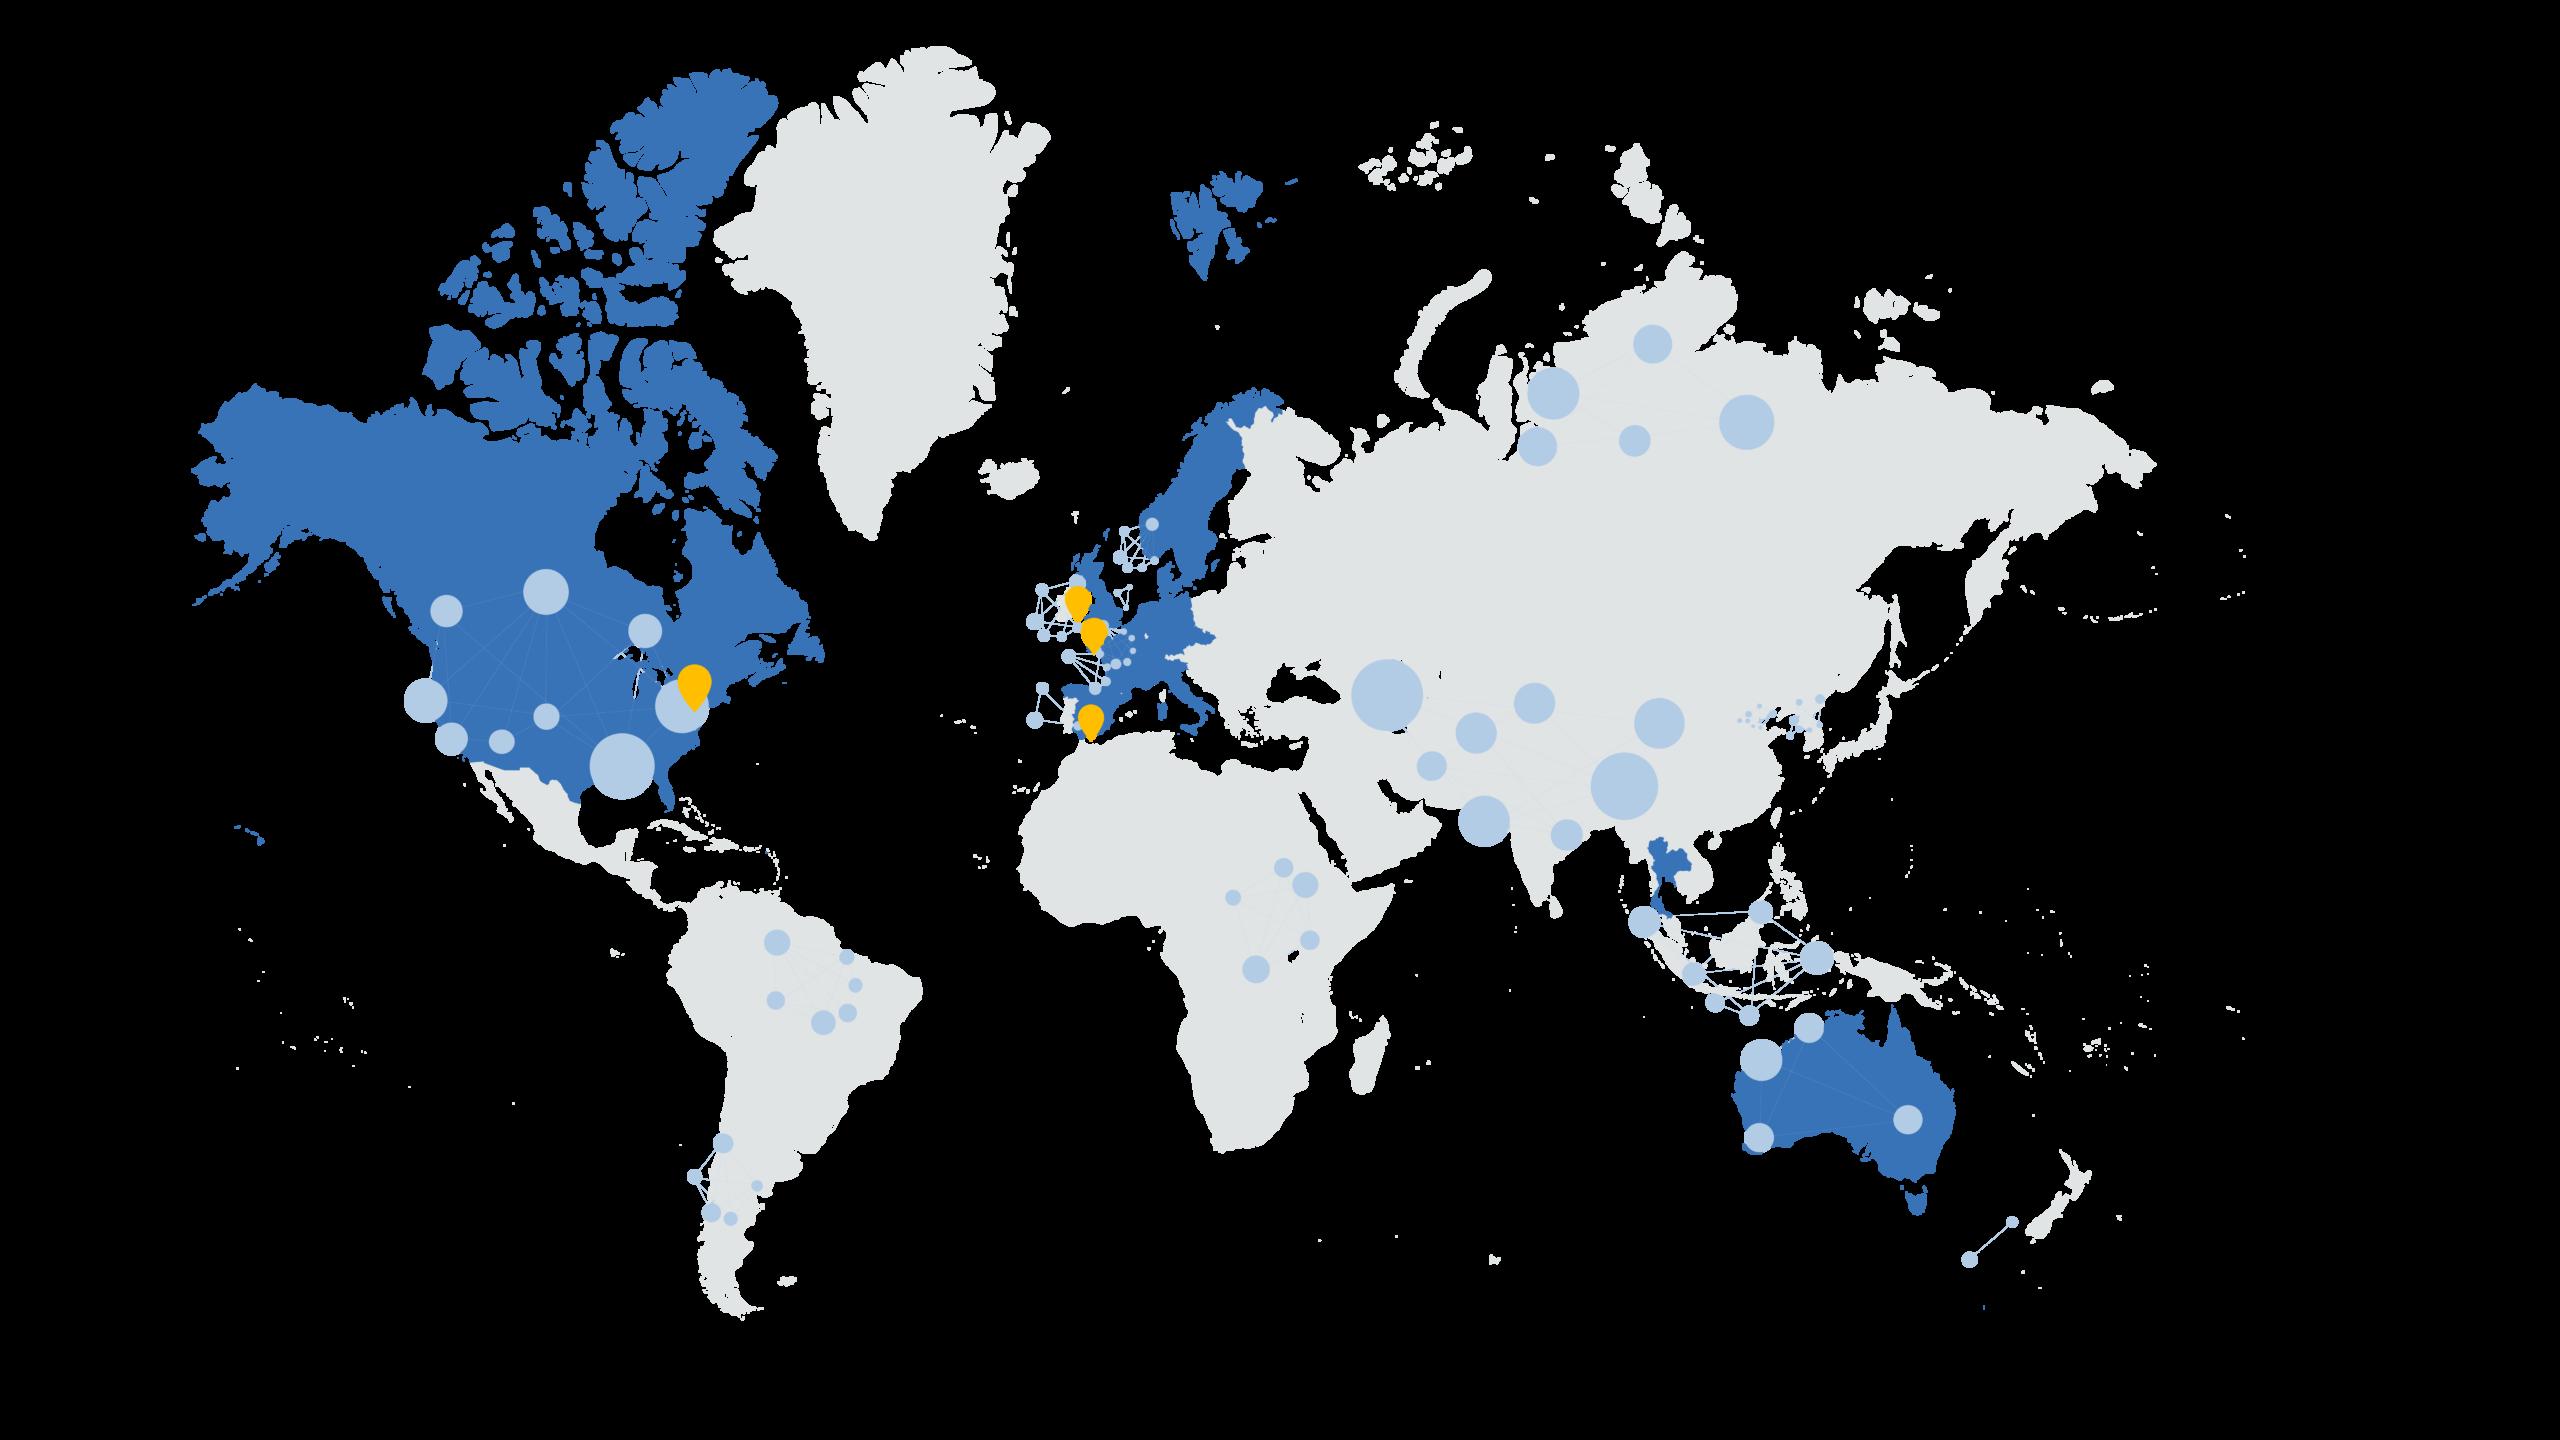 Map of activities illustration Data Impact